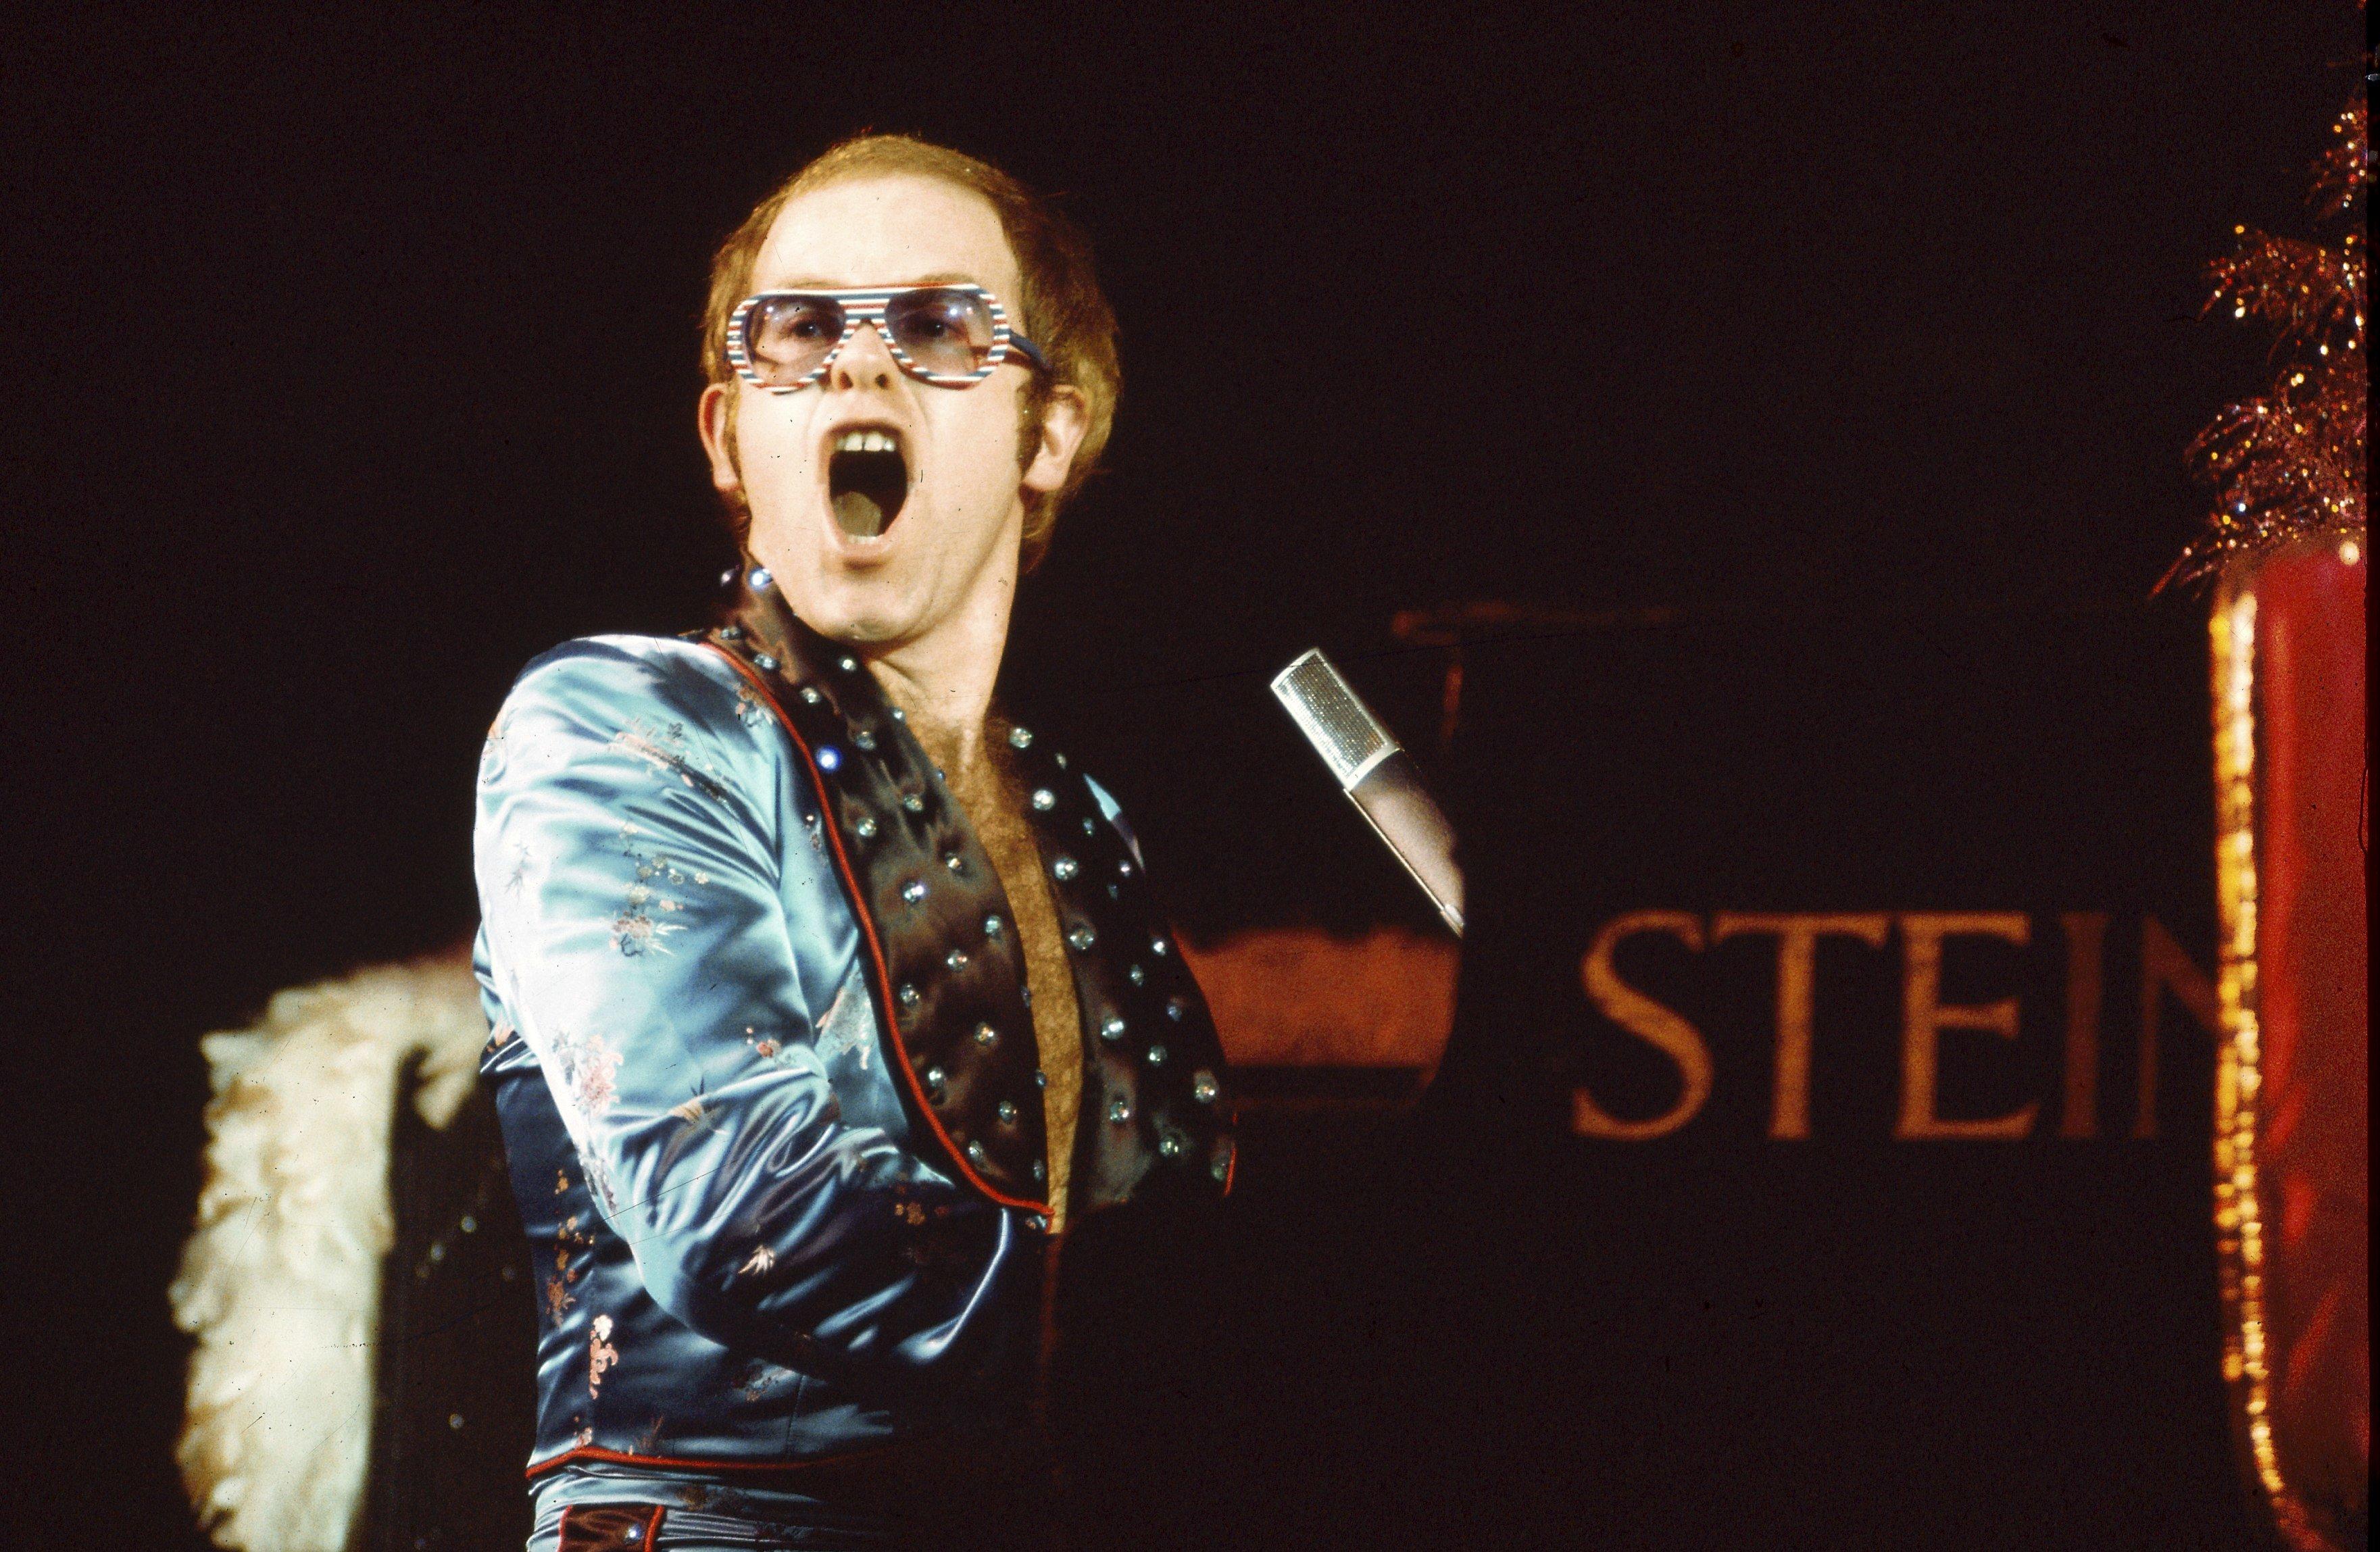 Elton john turns 60 barks out some birthday songs